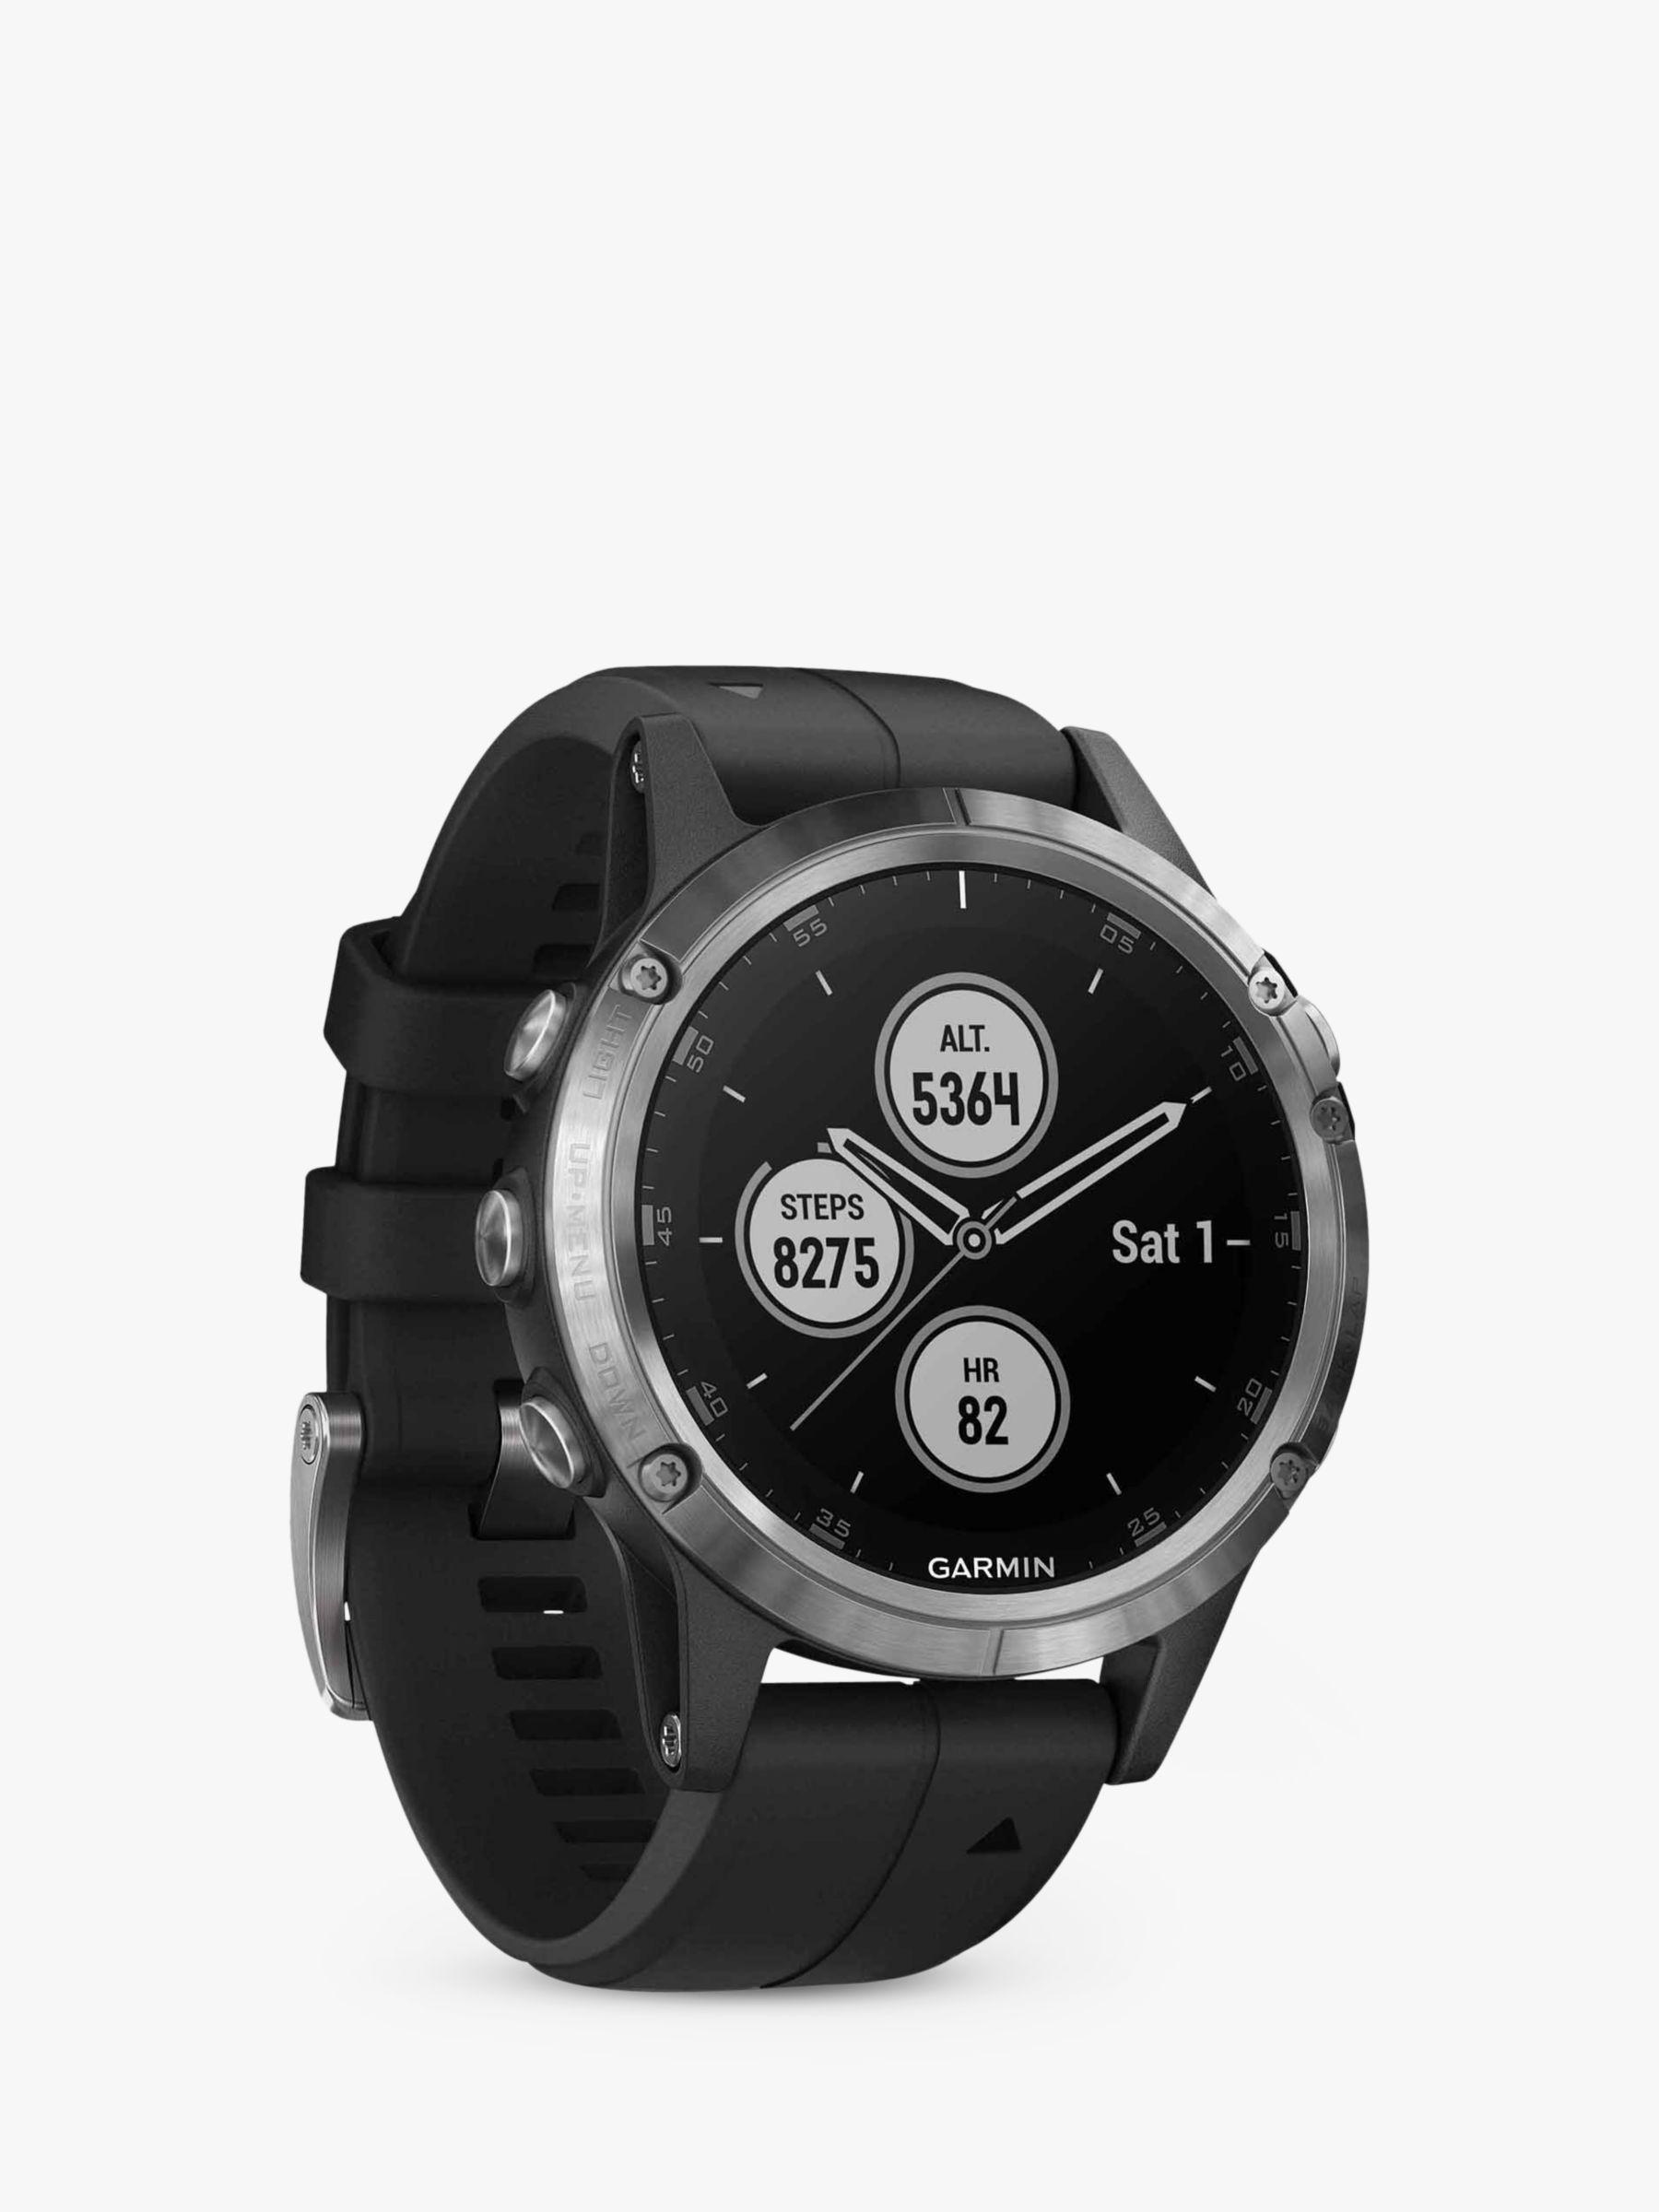 Garmin Garmin fēnix 5 Plus GPS Multisport Watch, Silver with Black Band, 4.7cm